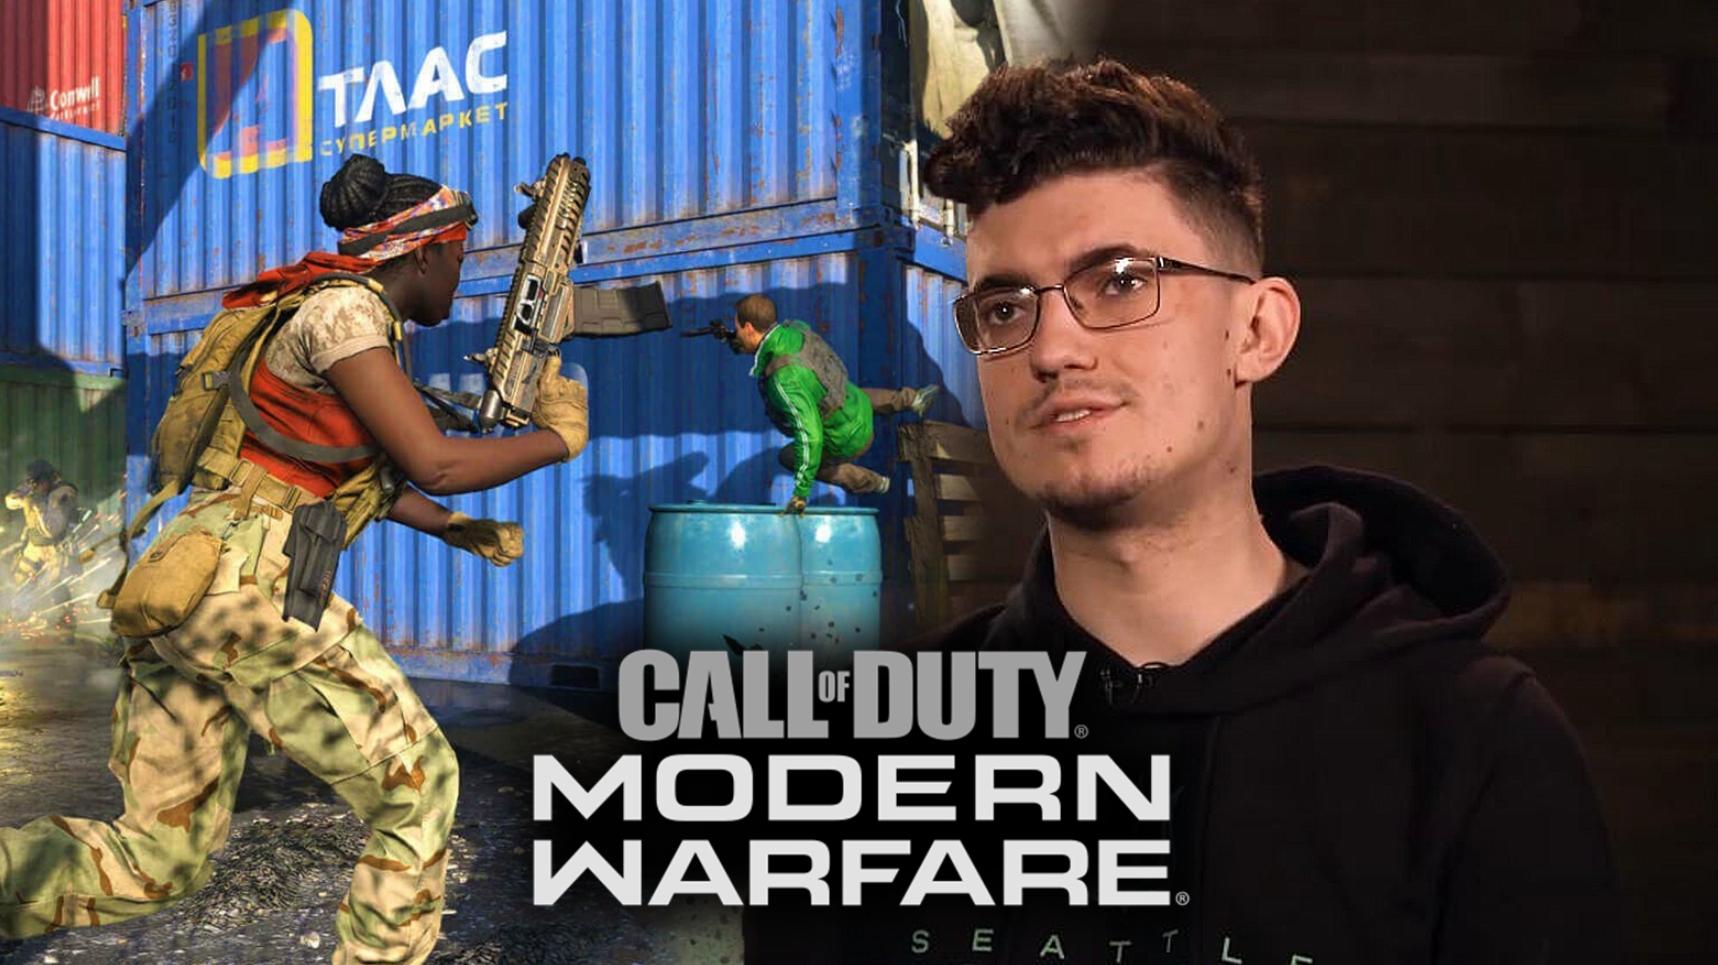 Call of Duty Modern Warfare / Call of Duty League pro Octane